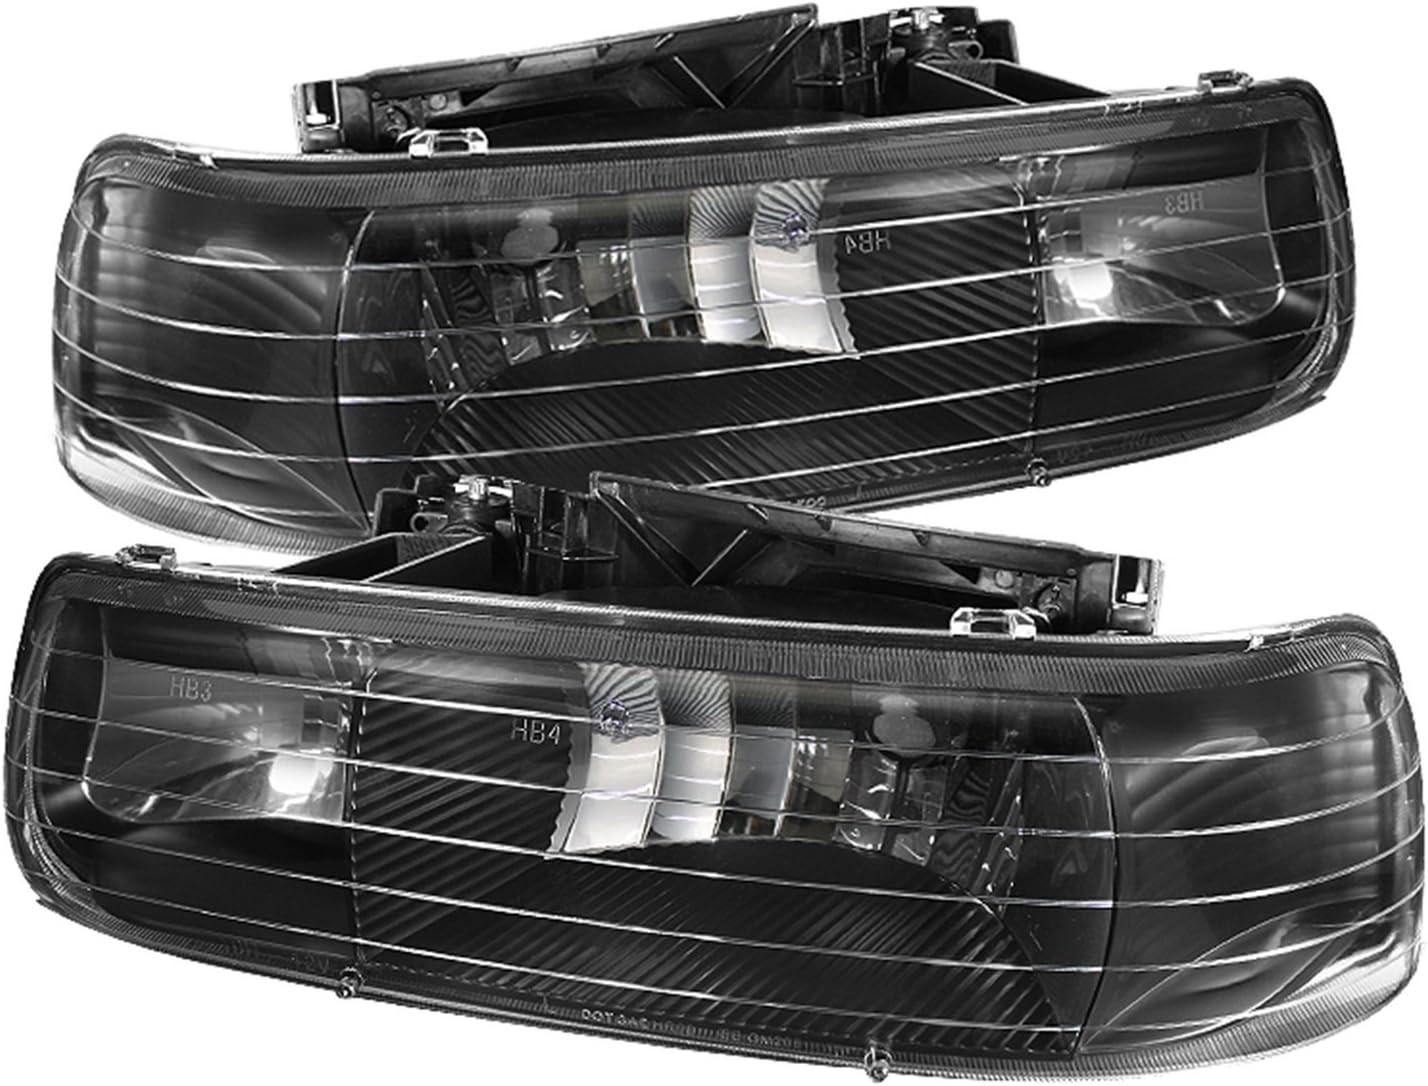 Fits Chevy Silverado 99-02 Spyder LED Fog Lights Chevy Suburban 00-06